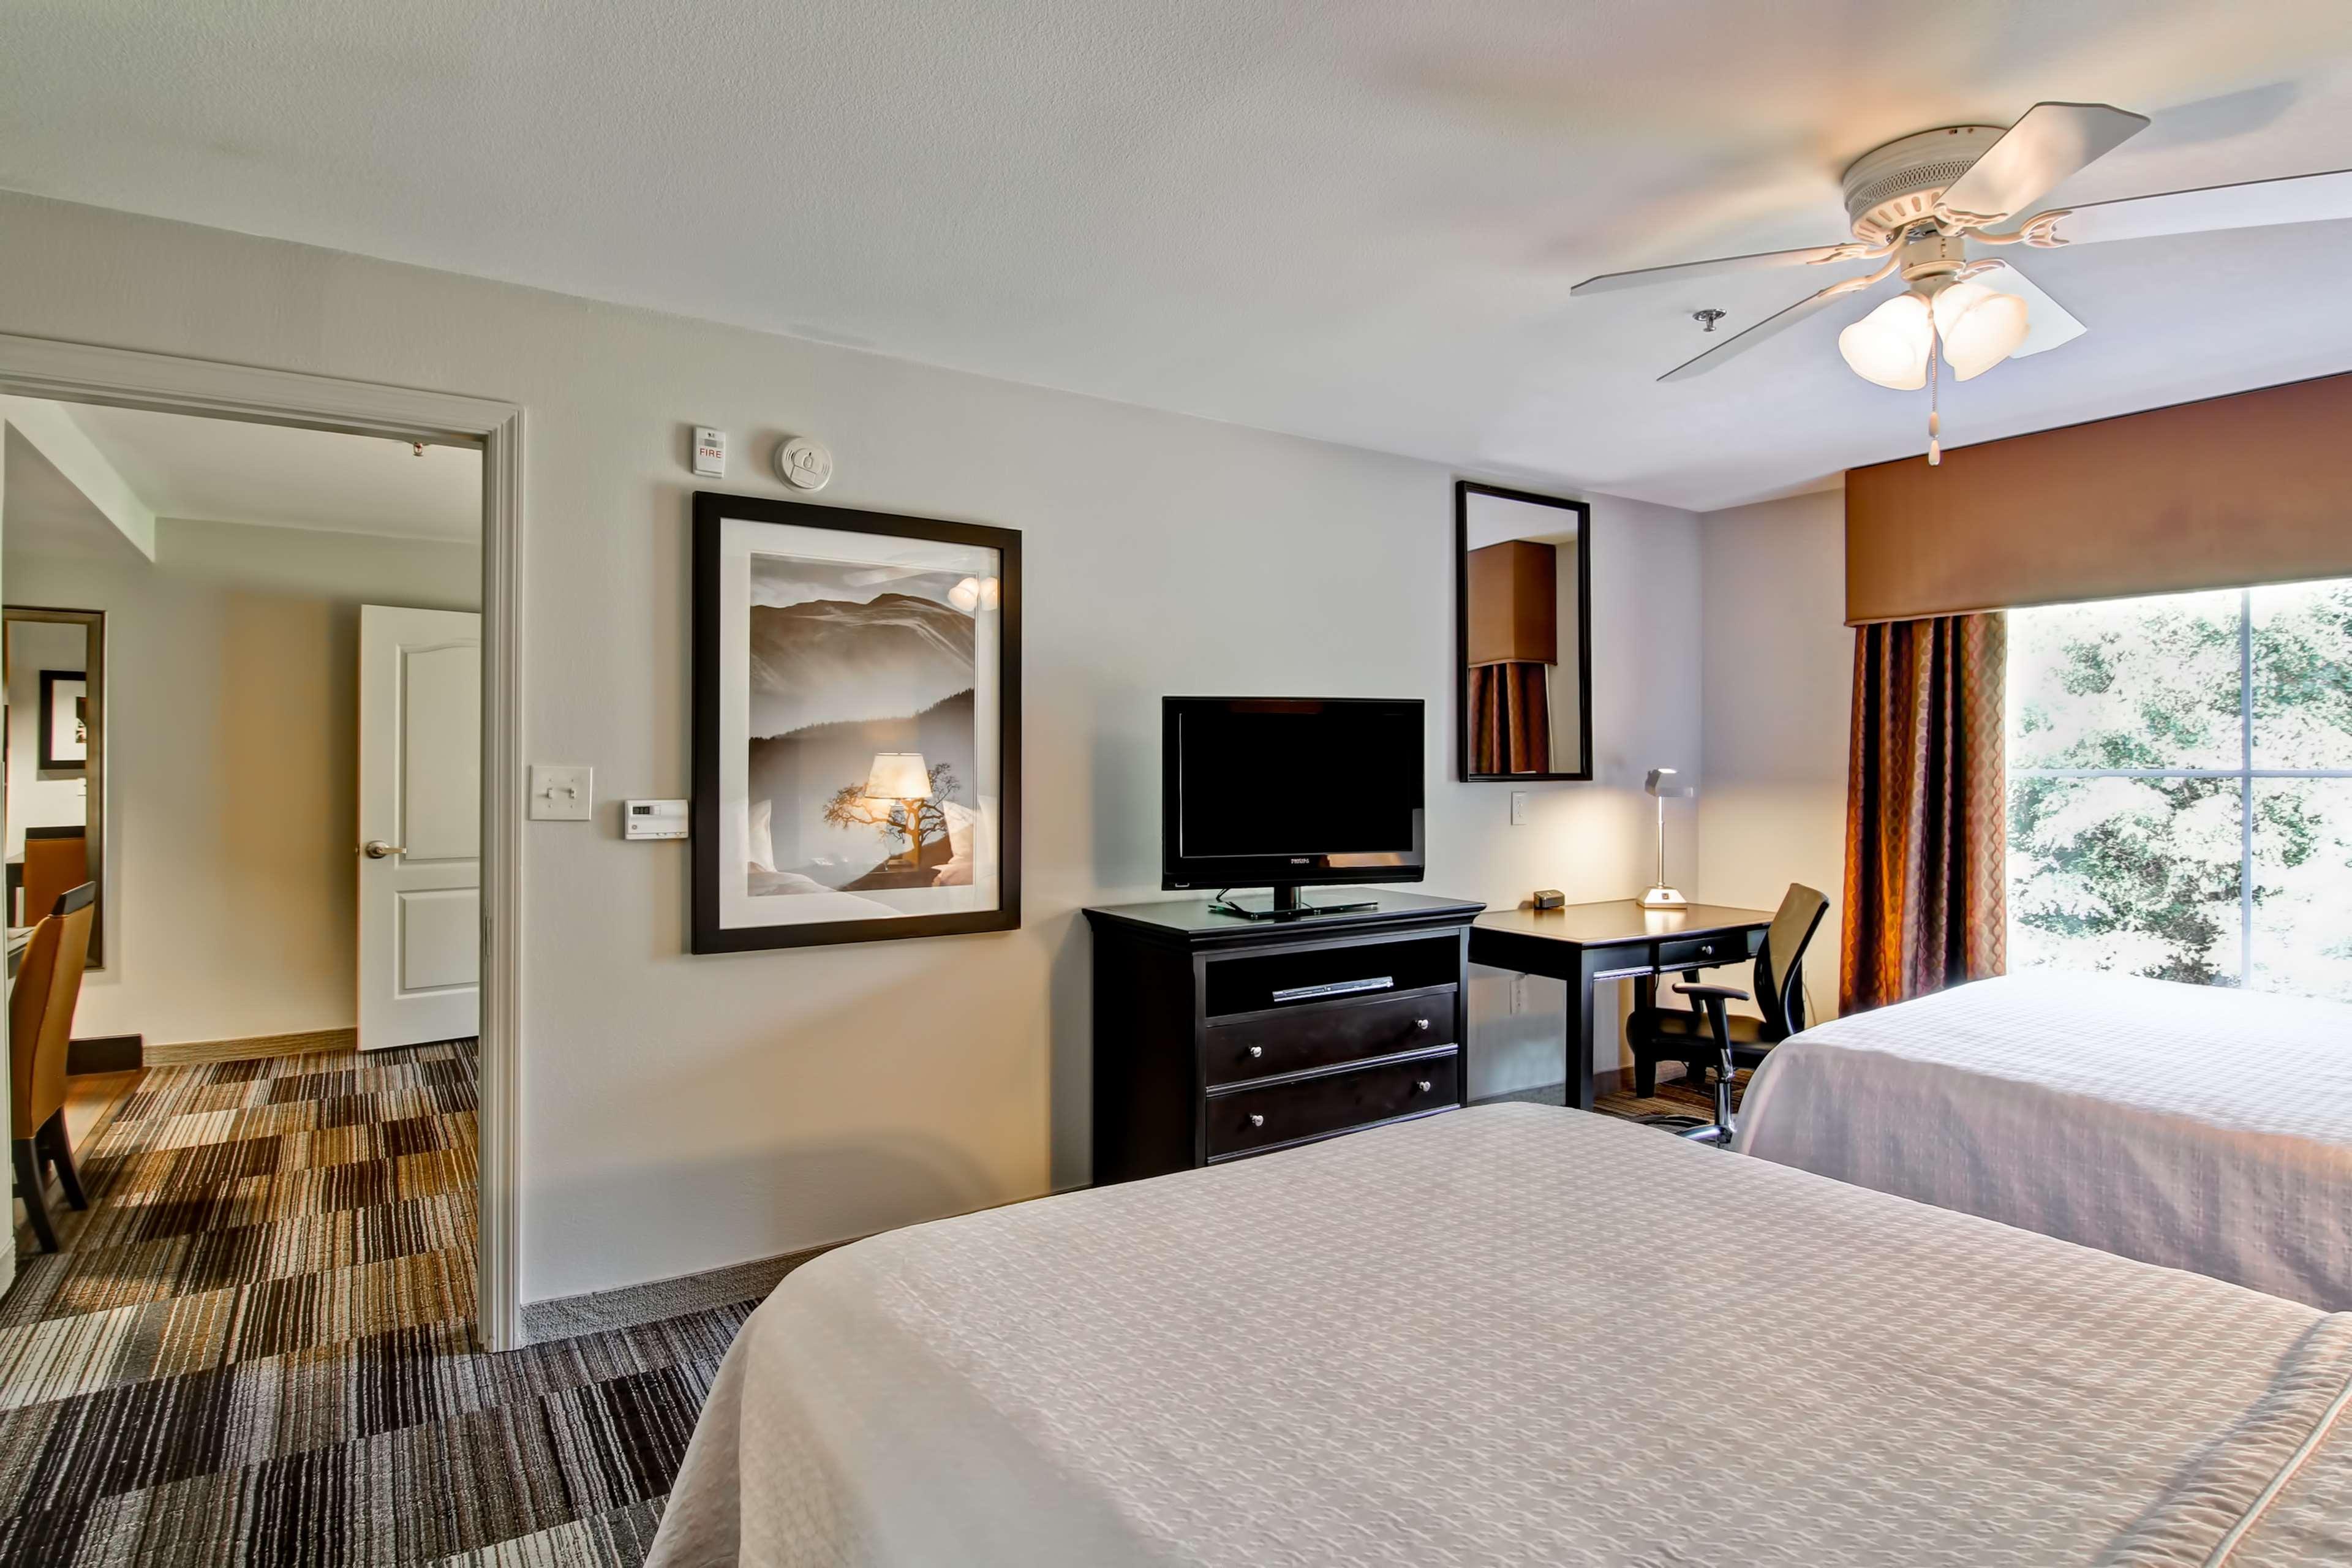 Homewood Suites by Hilton Cincinnati Airport South-Florence image 29